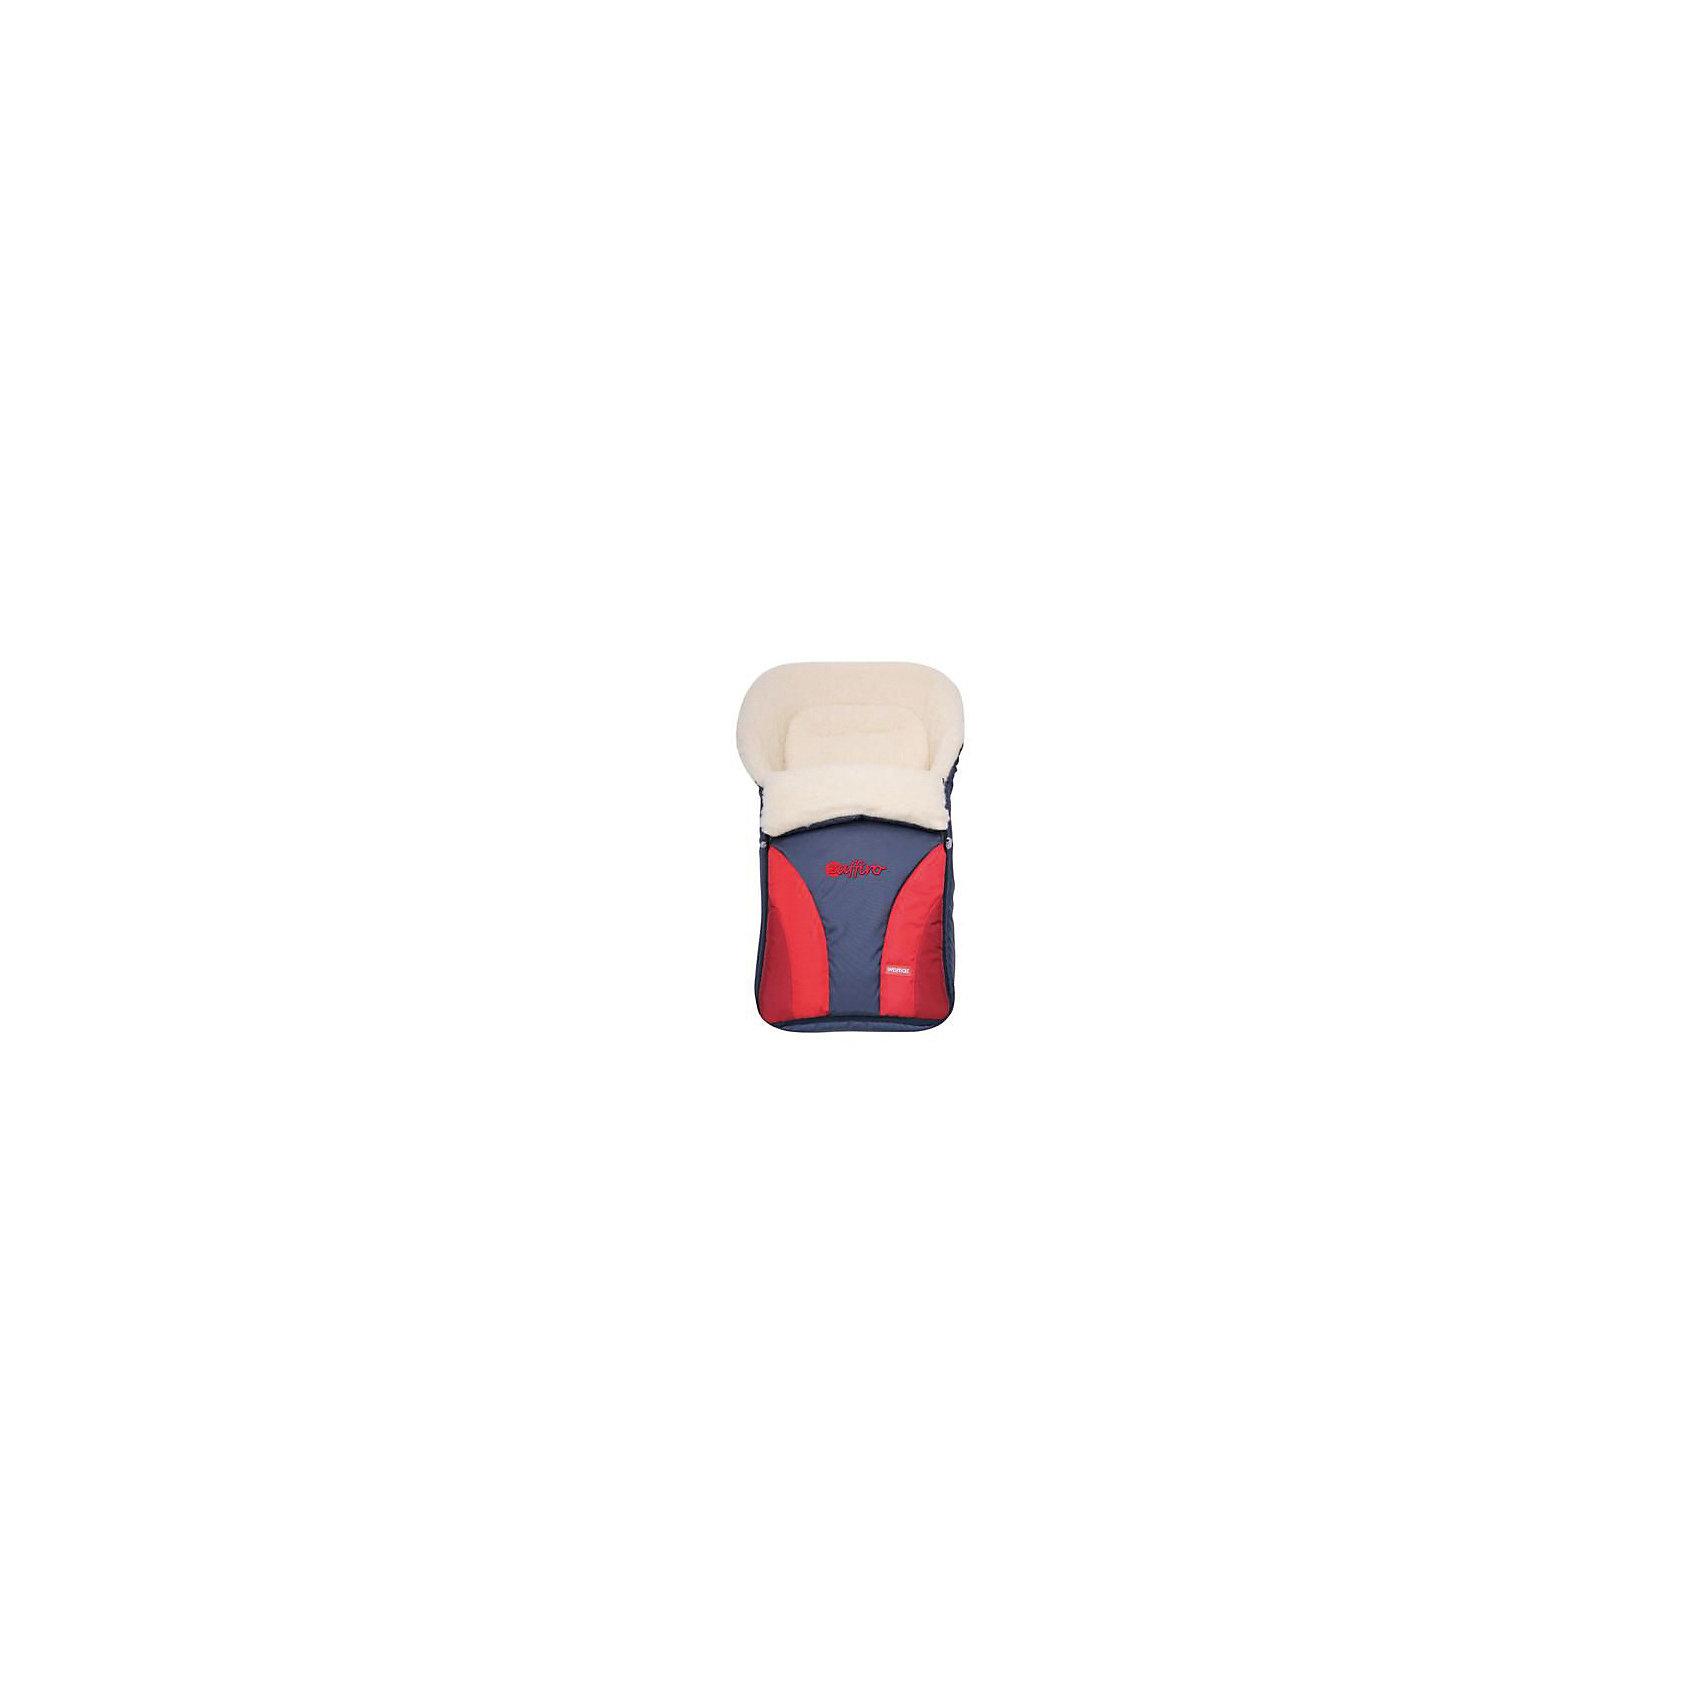 Womar Конверт зимний Crocus №24, 95*50, шерсть, Womar, красный конверт детский womar womar конверт в коляску зимний aurora красный